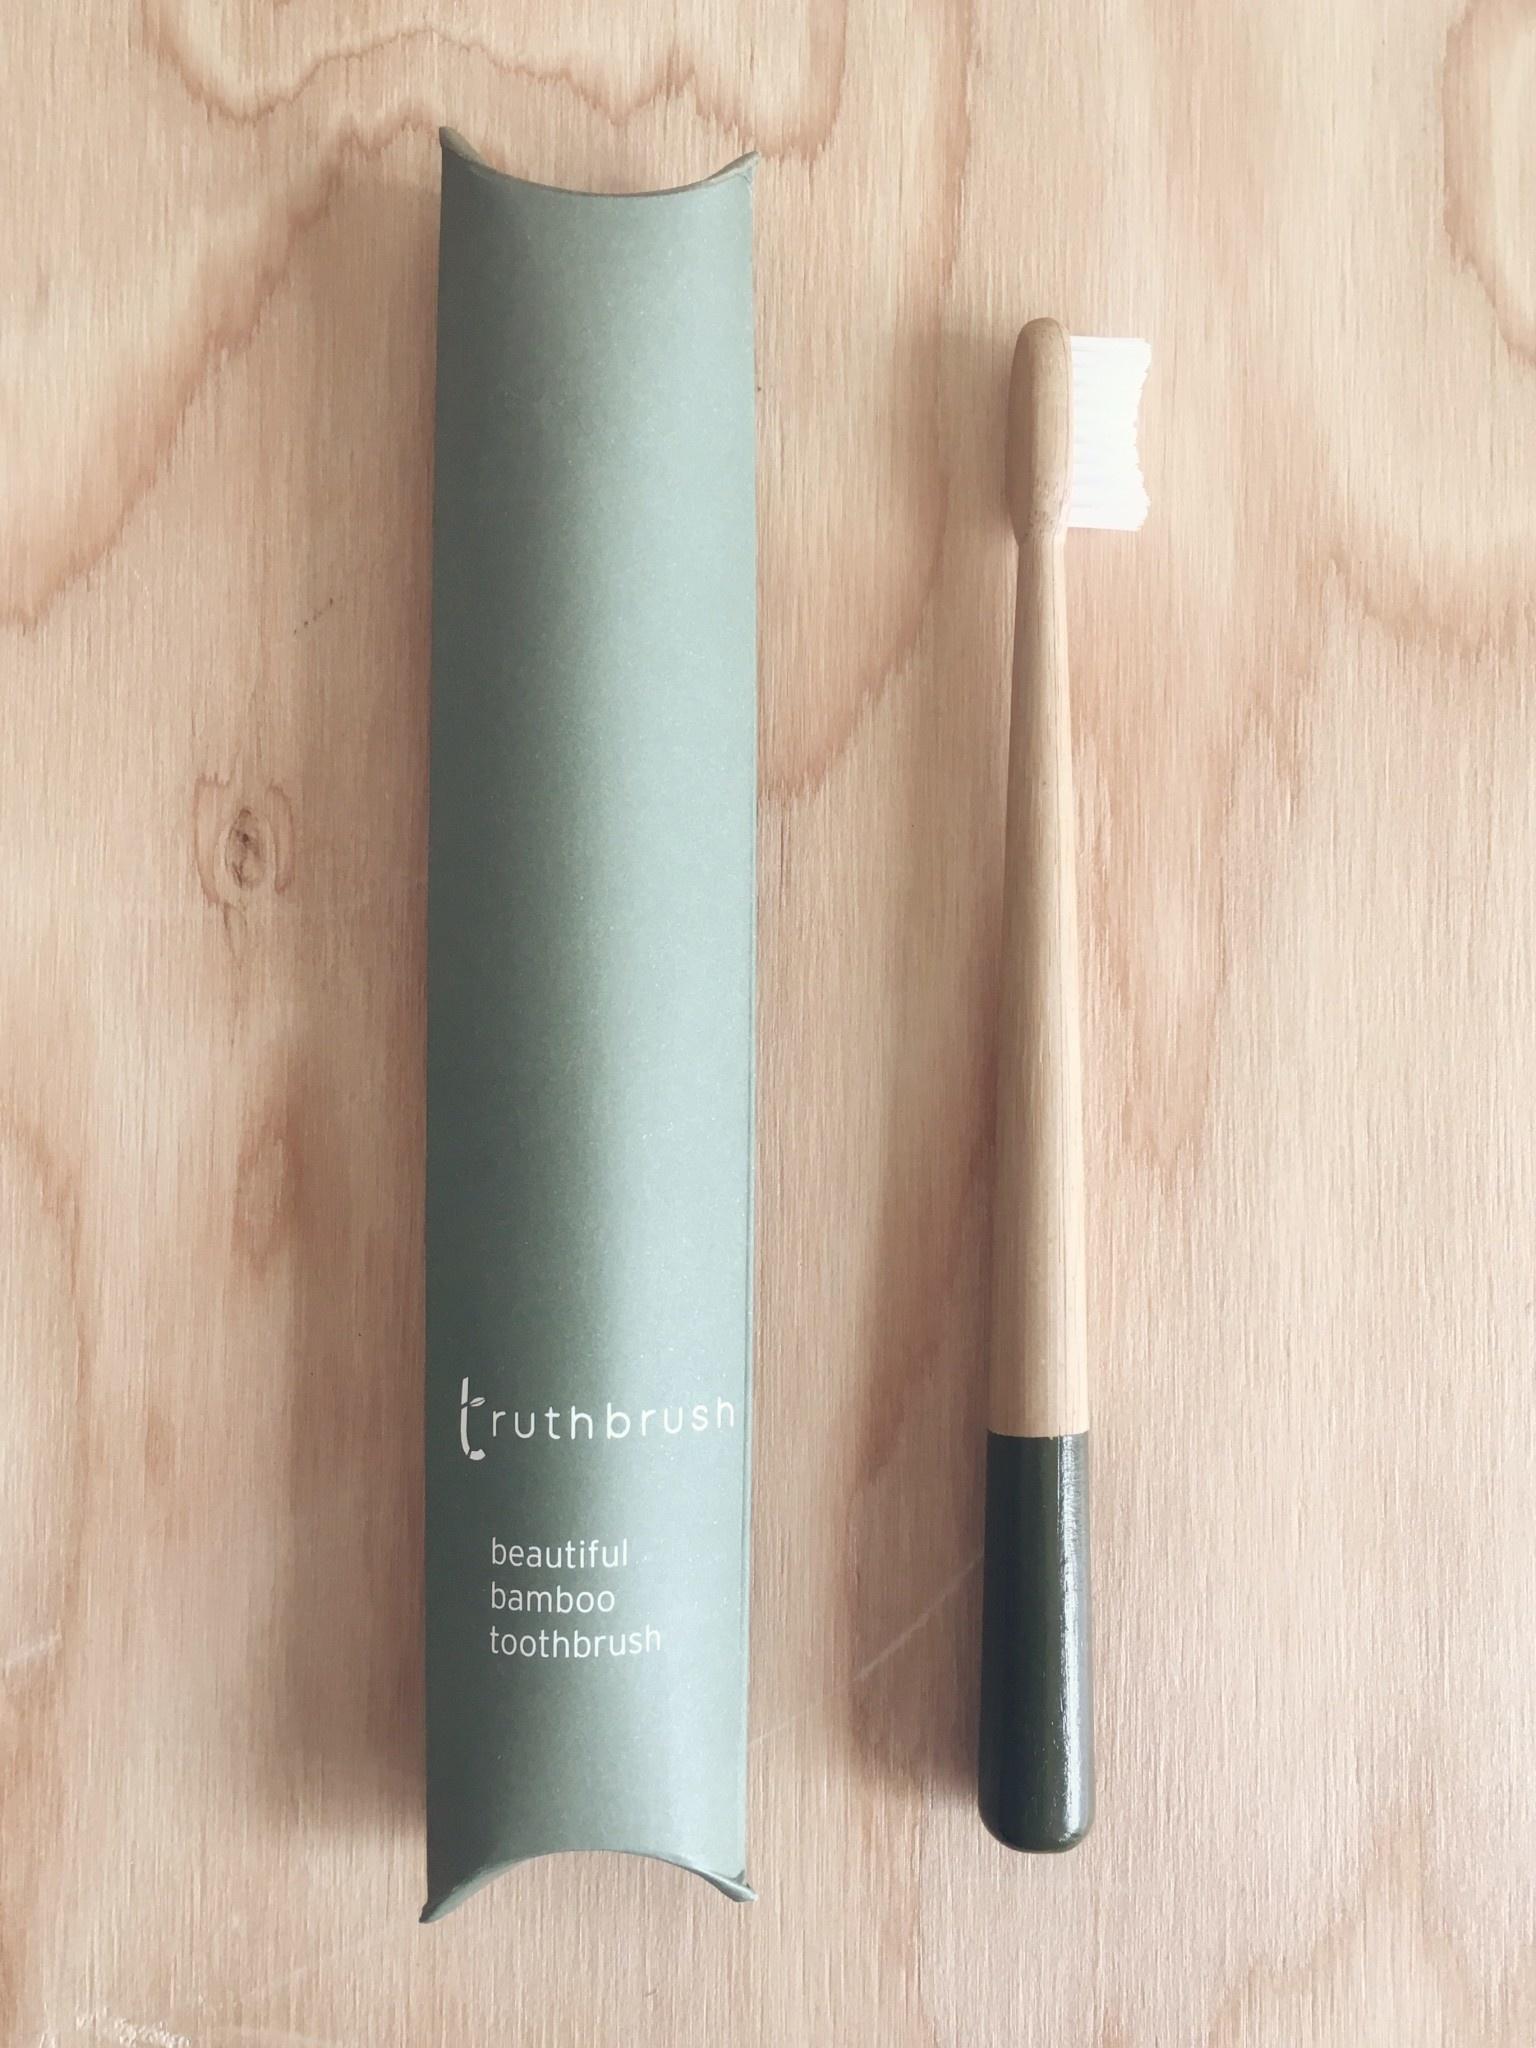 Truthbrush Bamboo Toothbrush - Medium Bristles